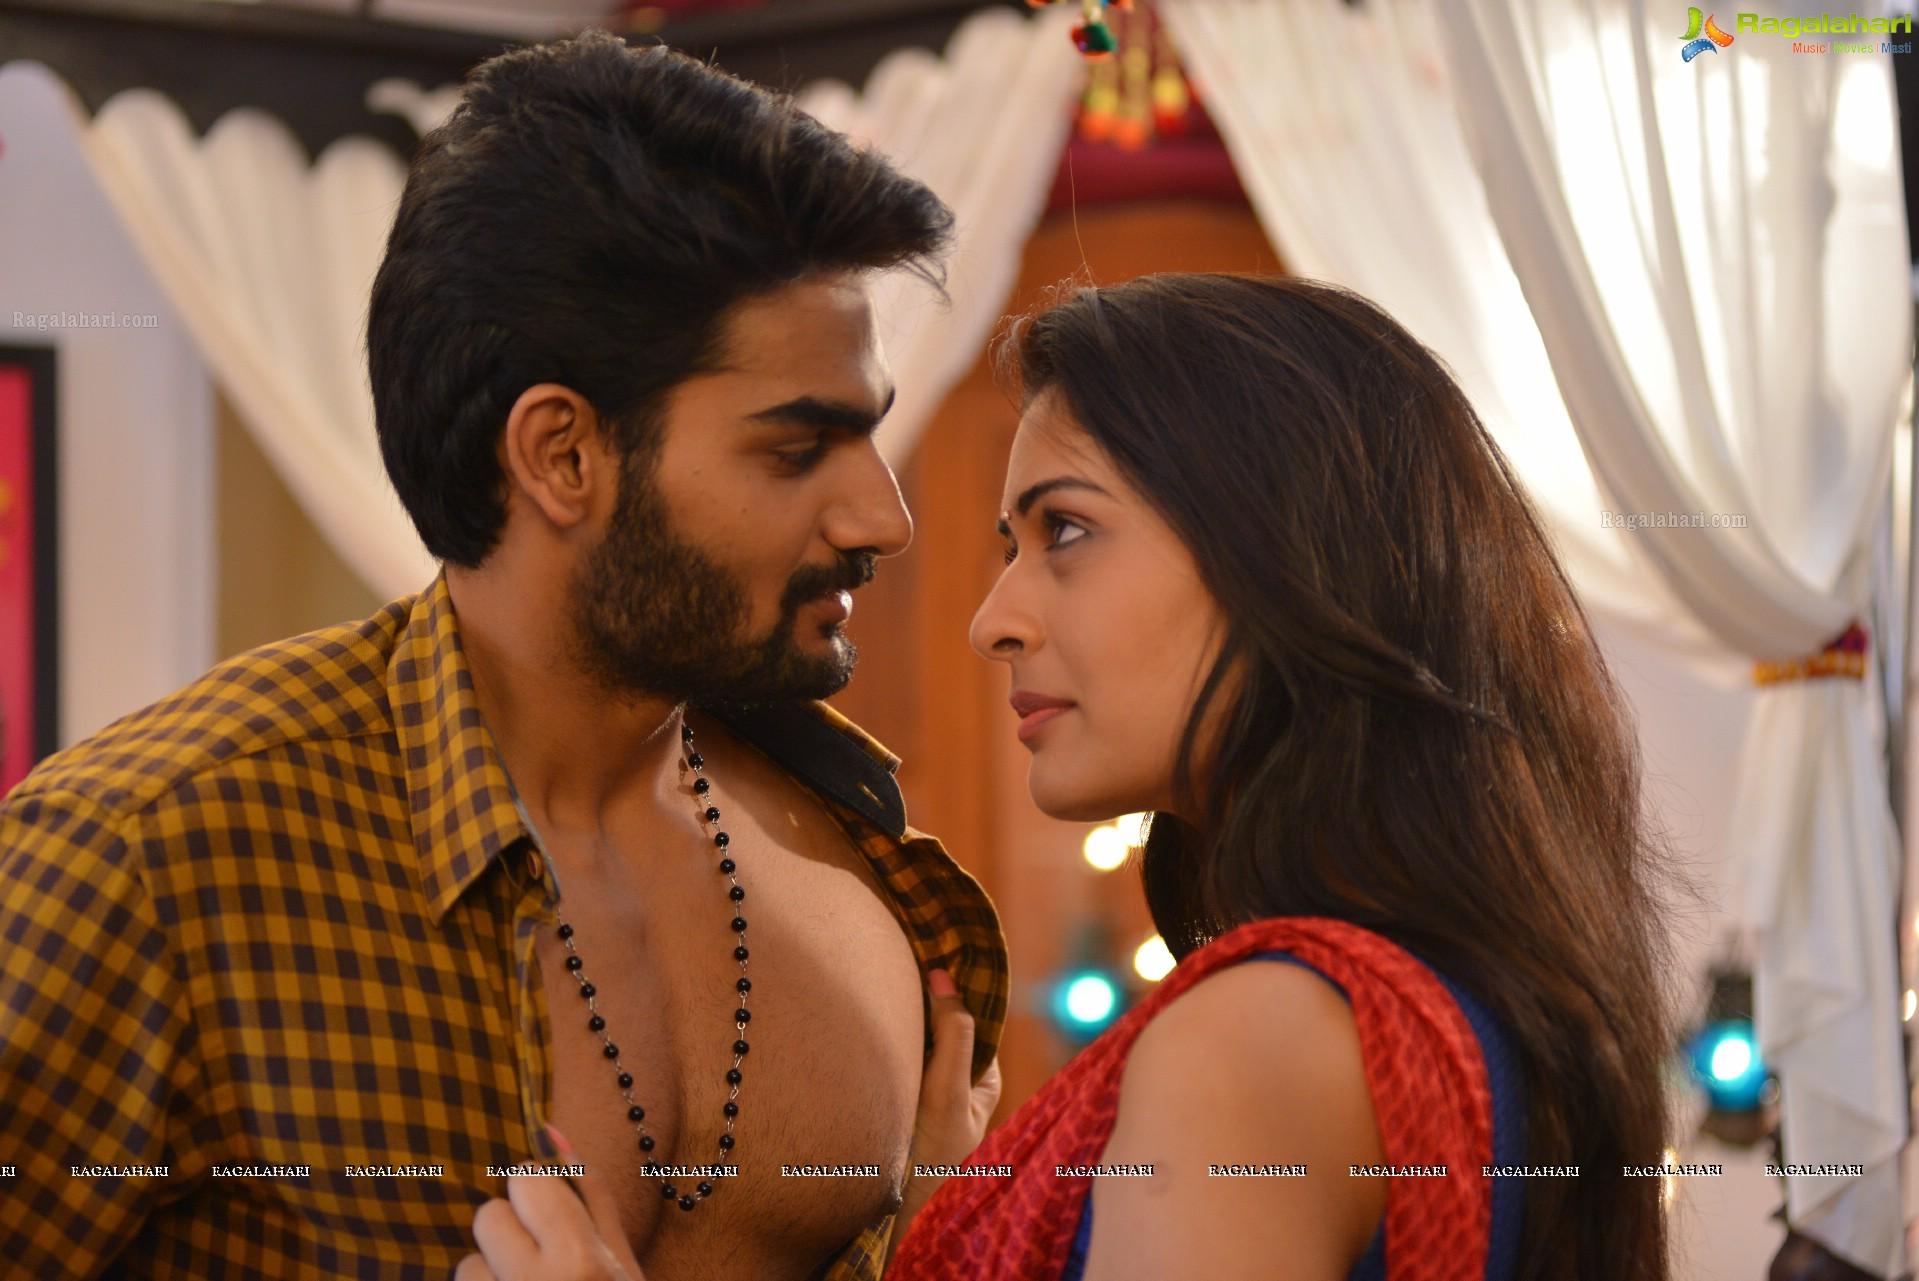 Rx 100 Telugu Cinema Stills Cast Kartikeya Payal Rajput